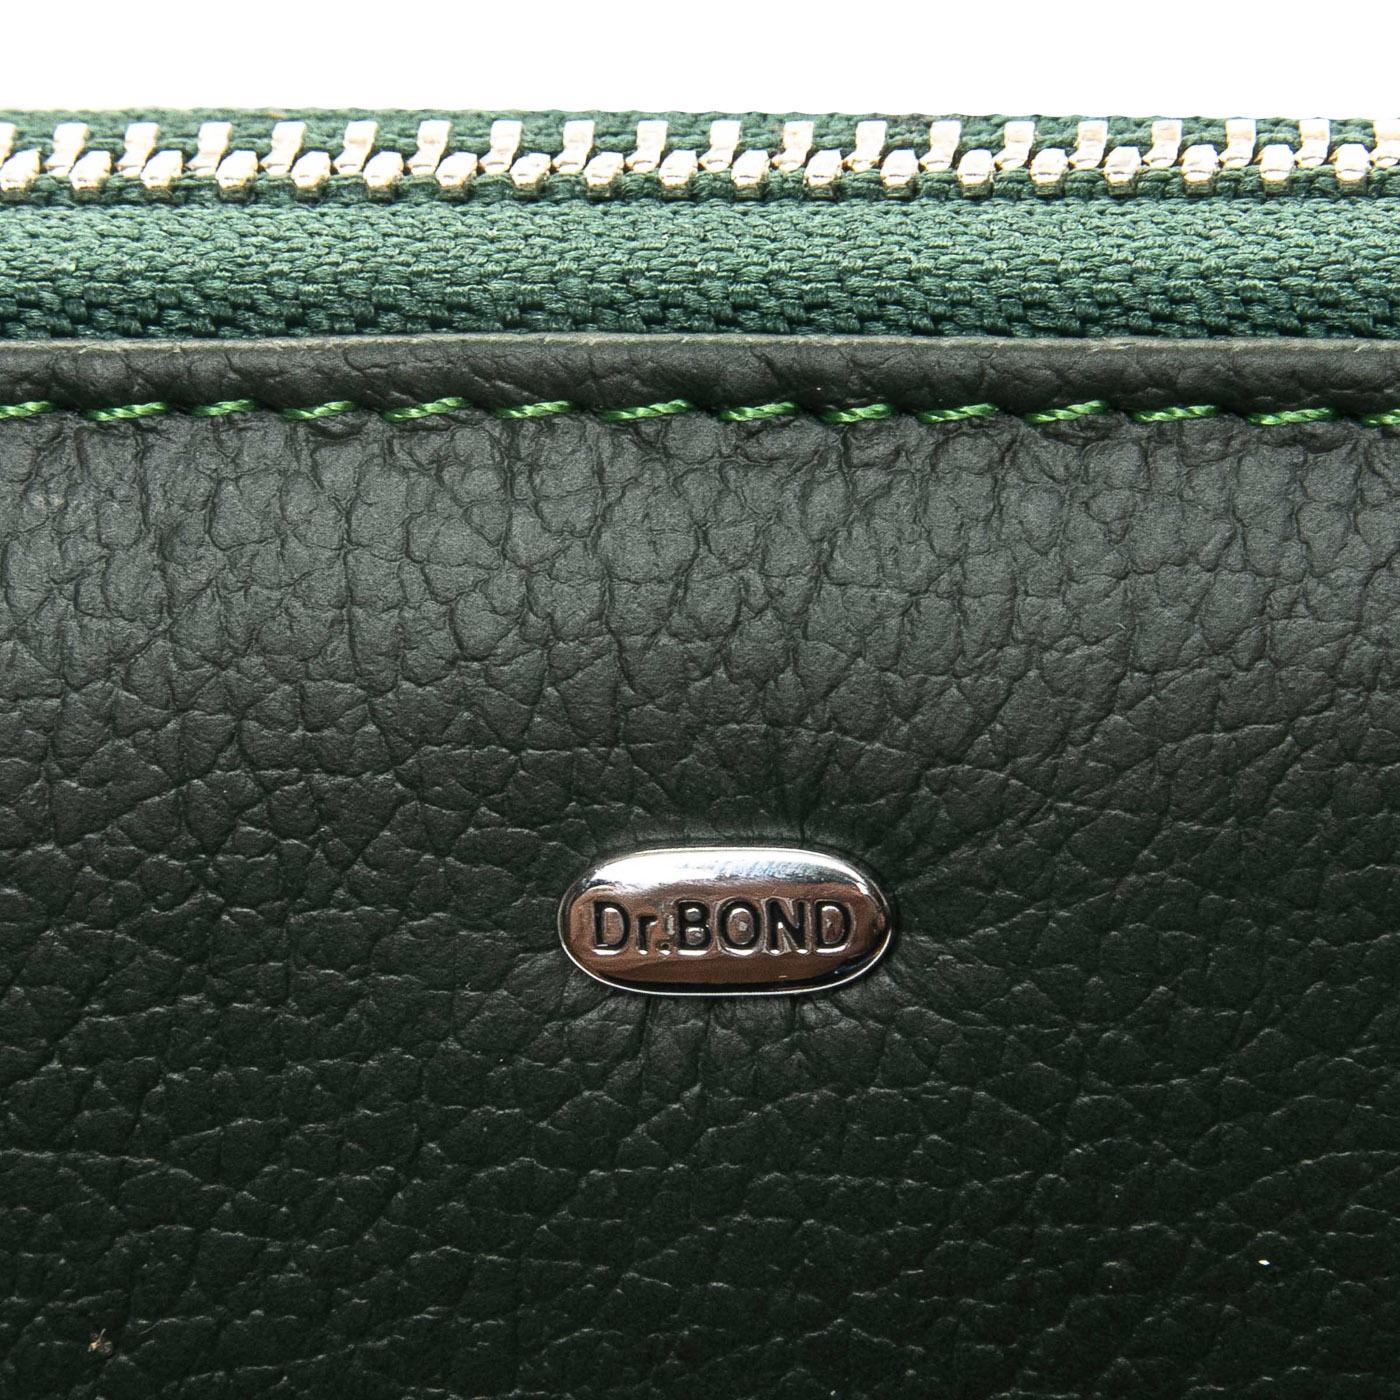 Кошелек Classic кожа DR. BOND WS-8 green - фото 3